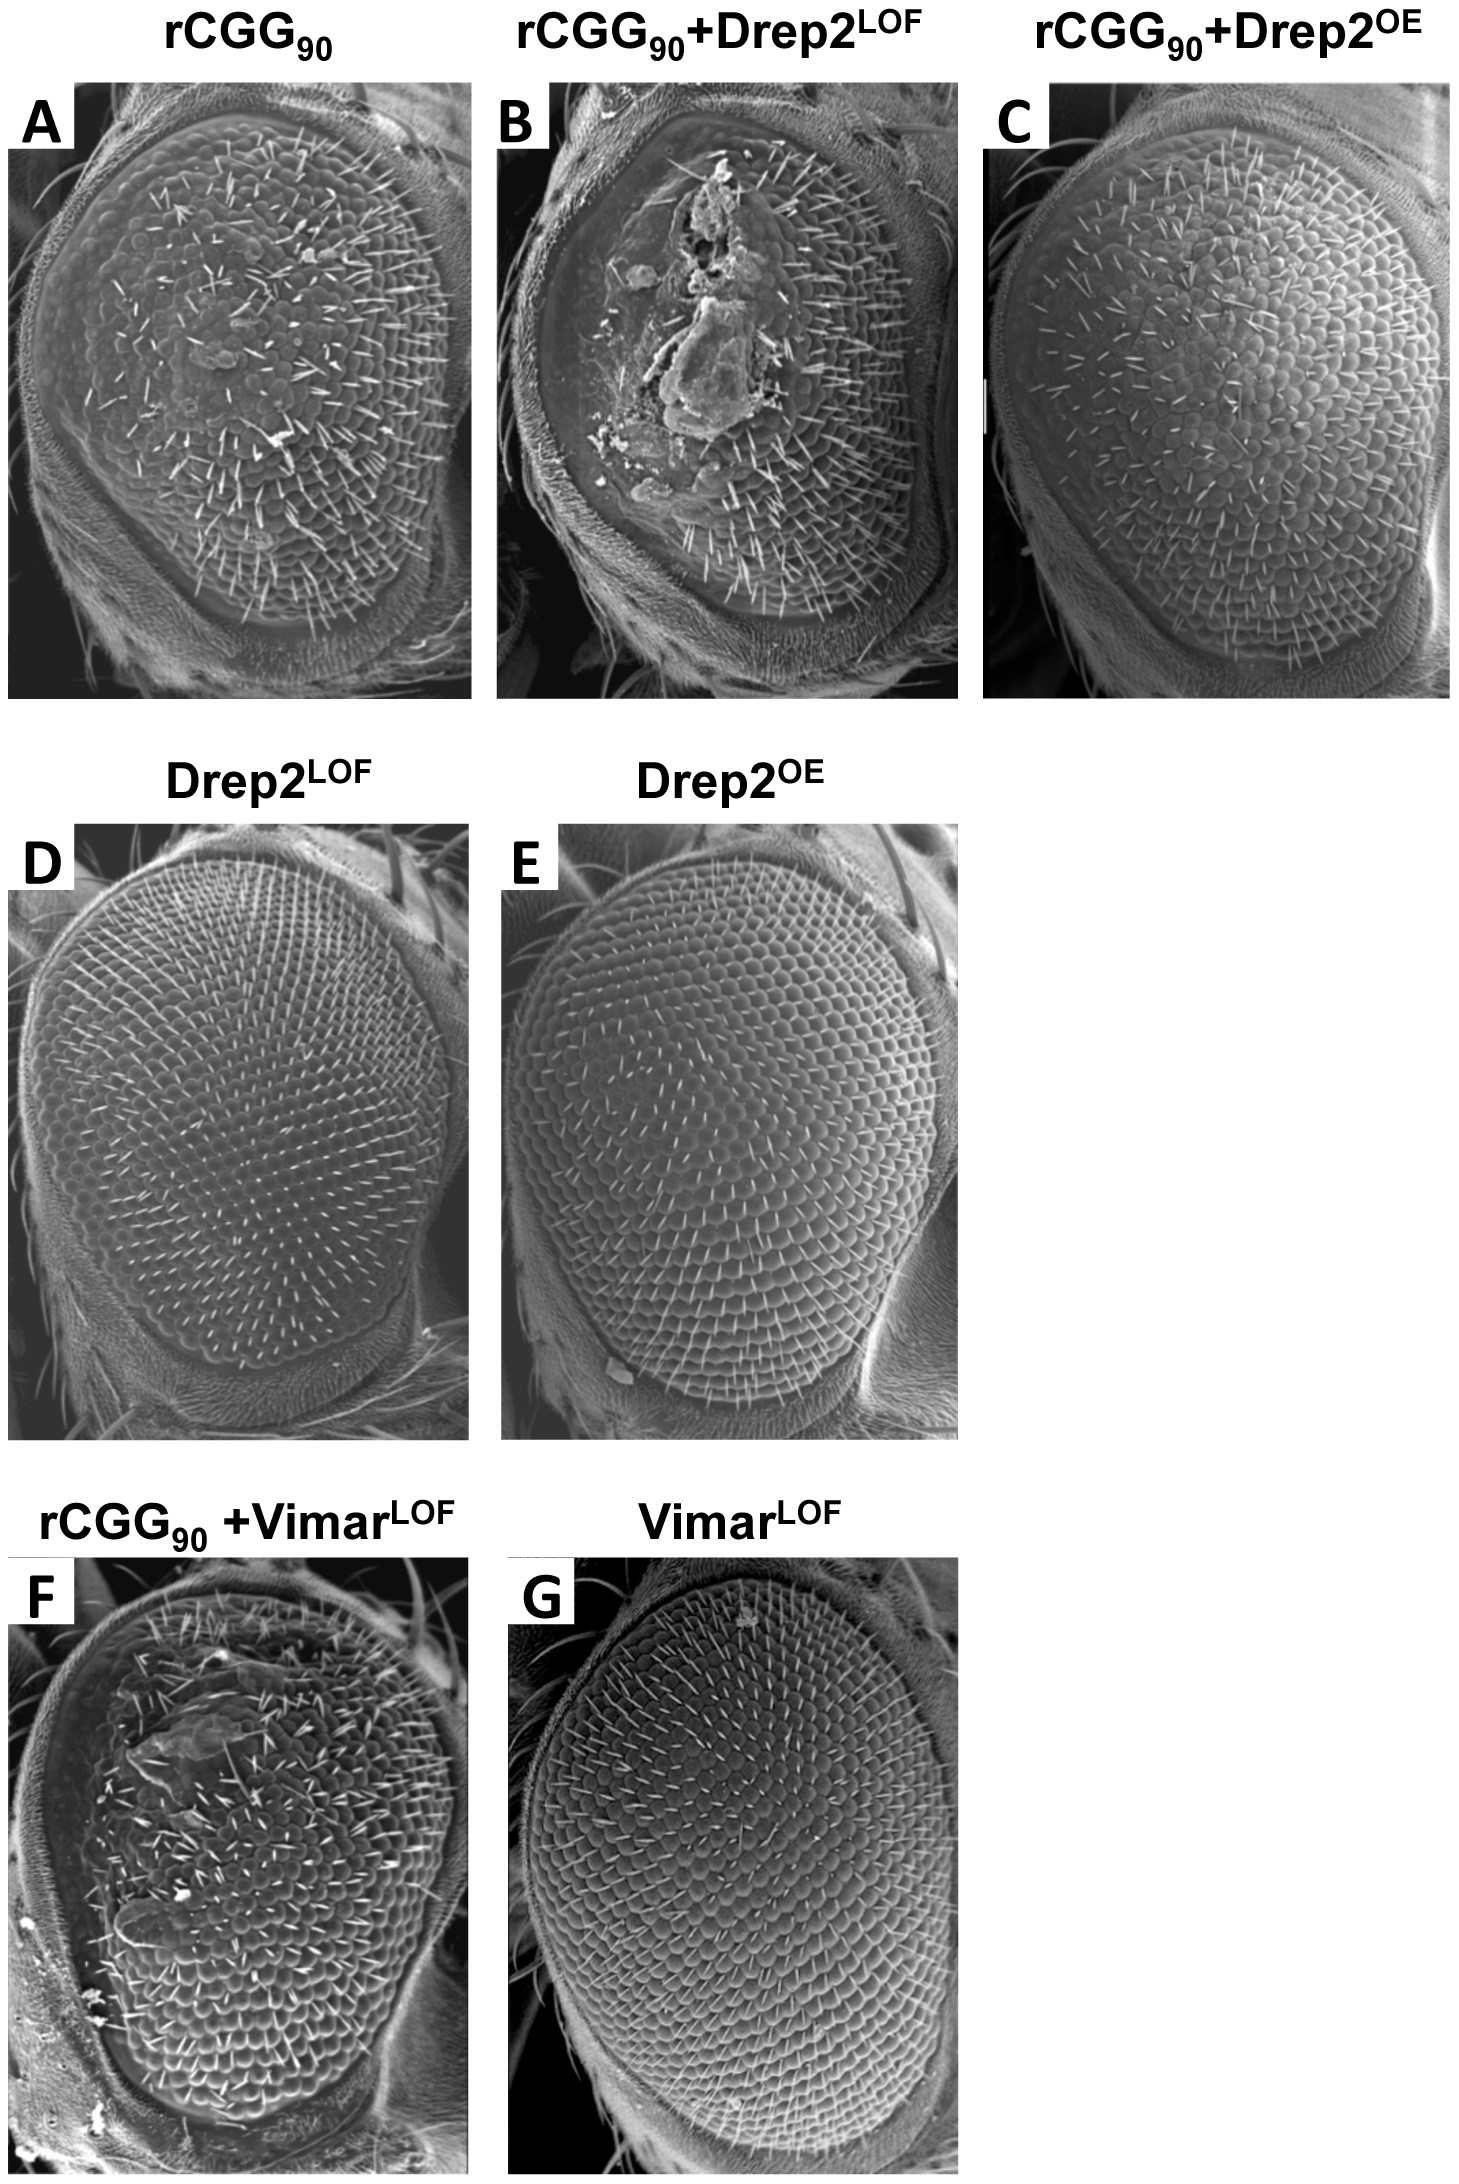 Modification of rCGG-mediated neurodegenerative eye phenotype by Drep-2 and Vimar.